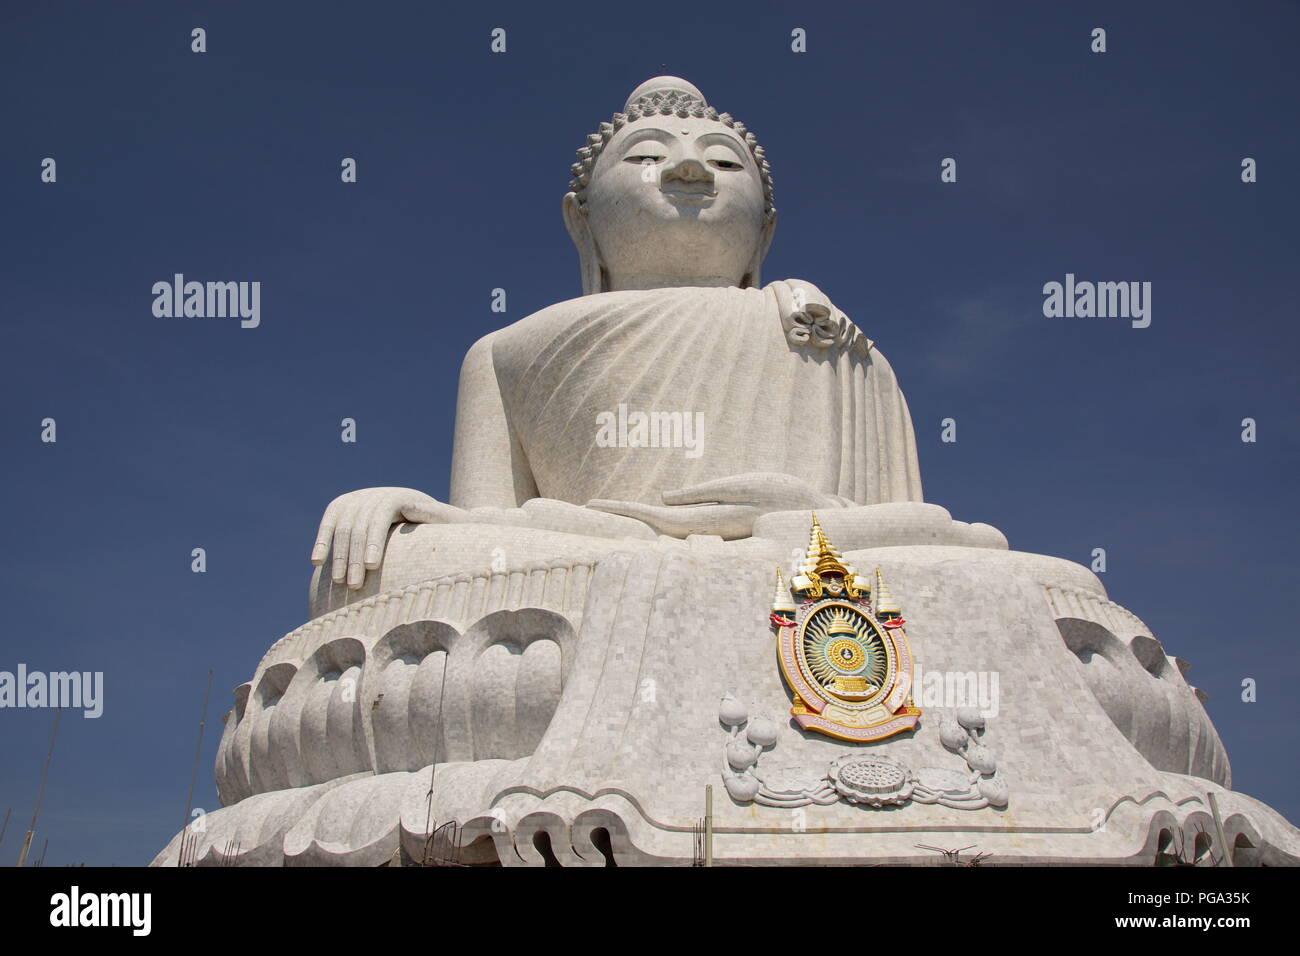 El gran Buda de Phuket, Tailandia Foto de stock